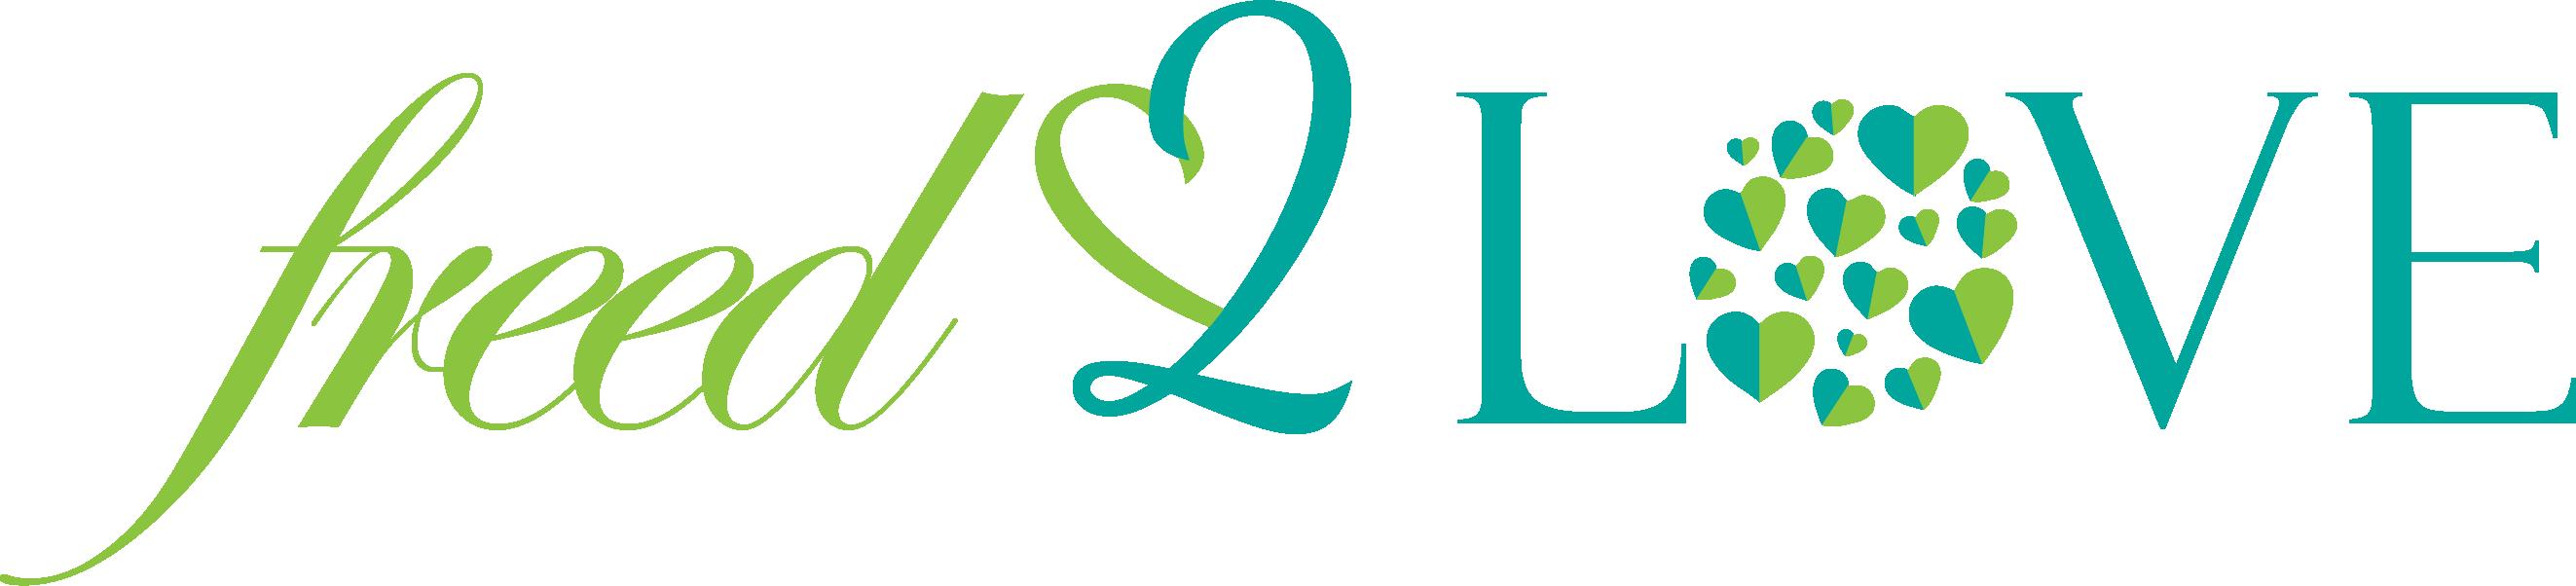 Freed 2 Love logo